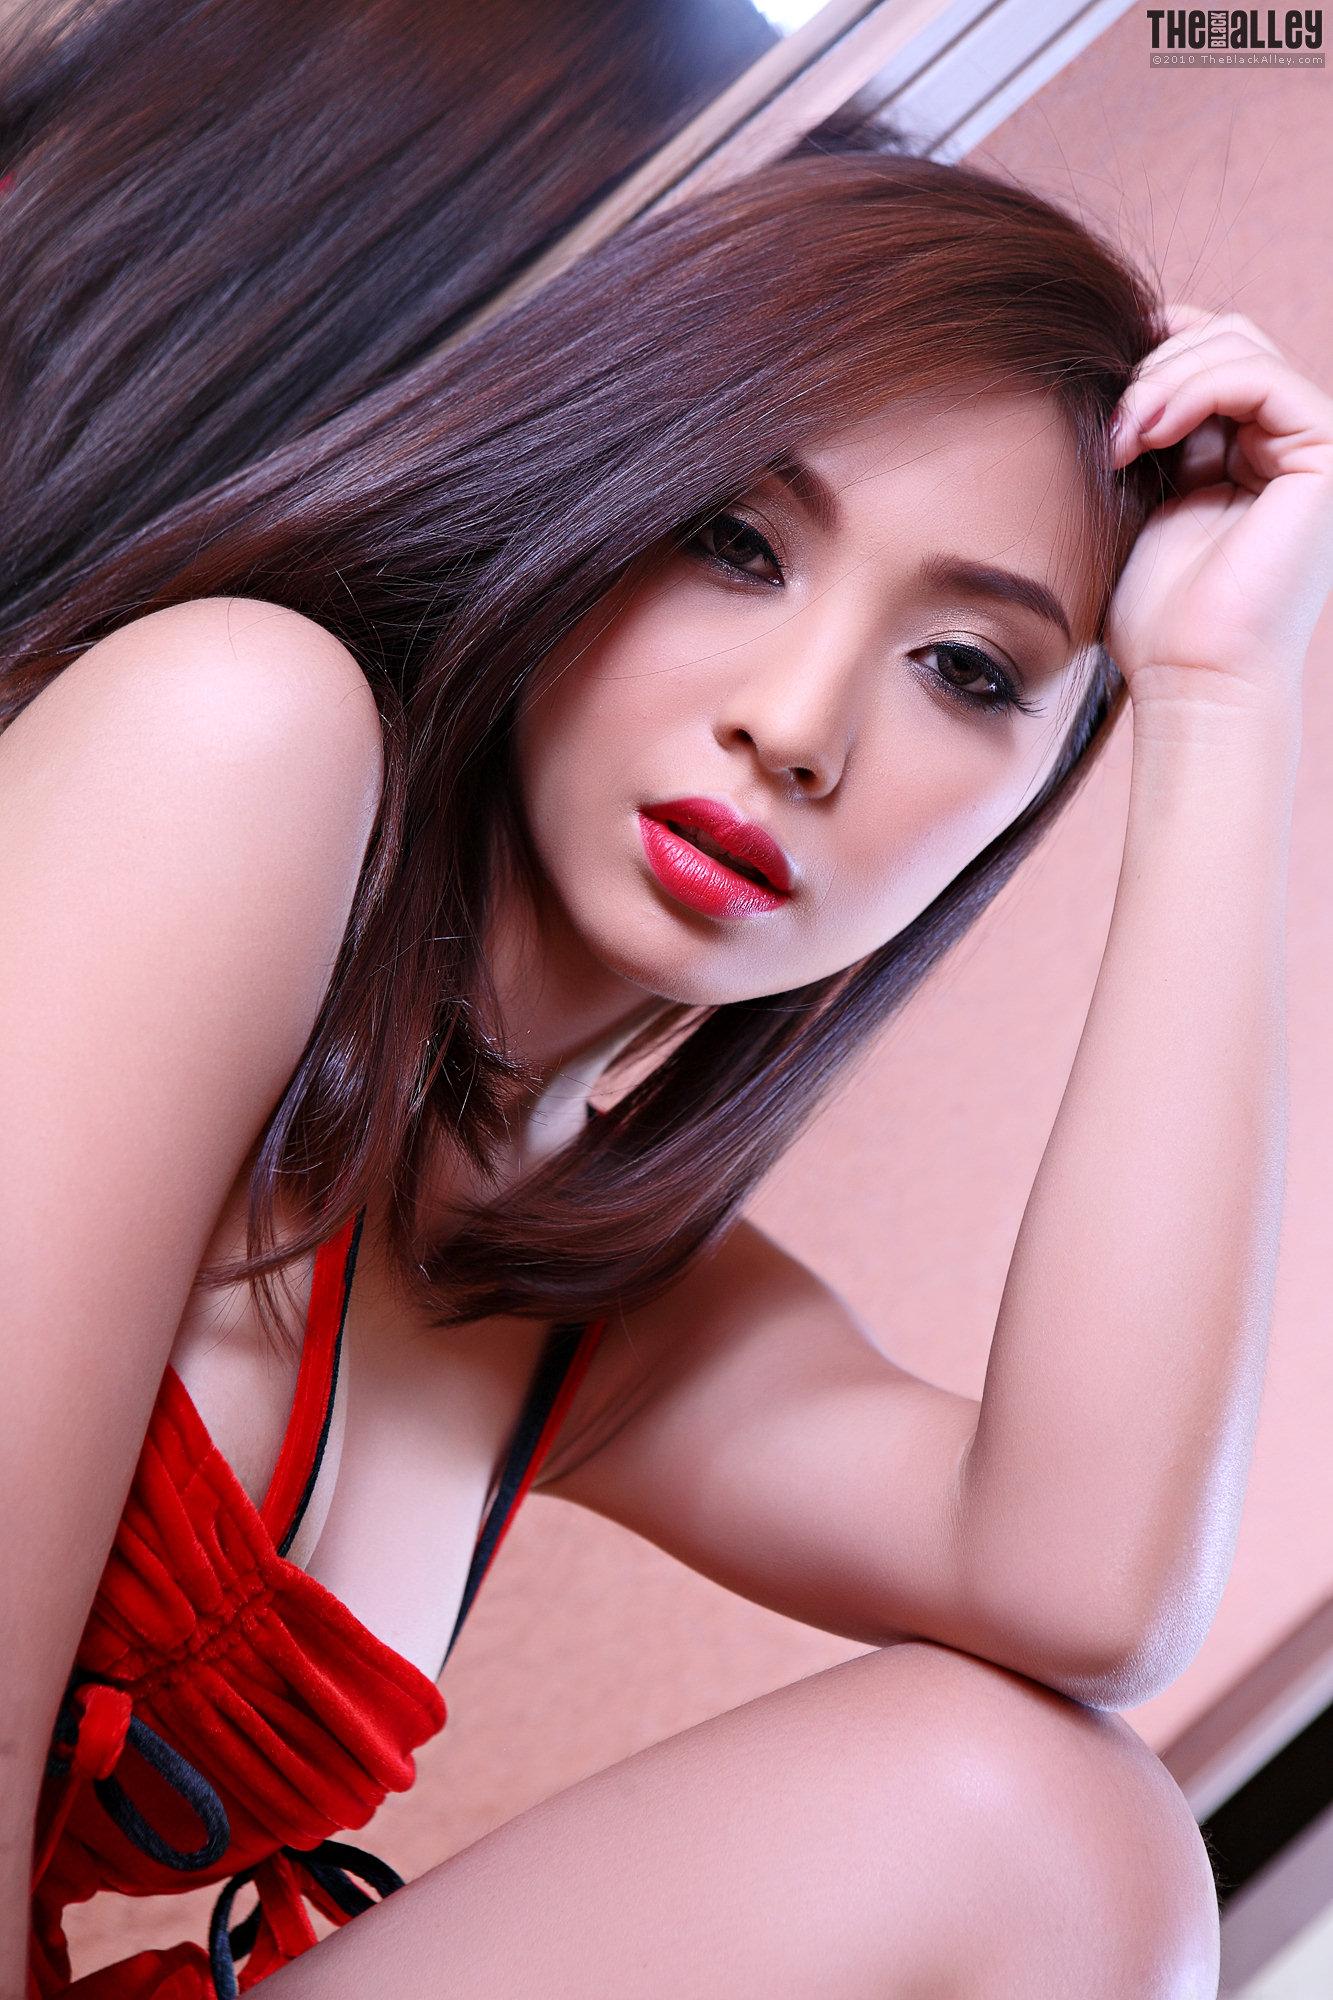 Bellina   Mixed Babes Perfect Breast  Set No.7 ...